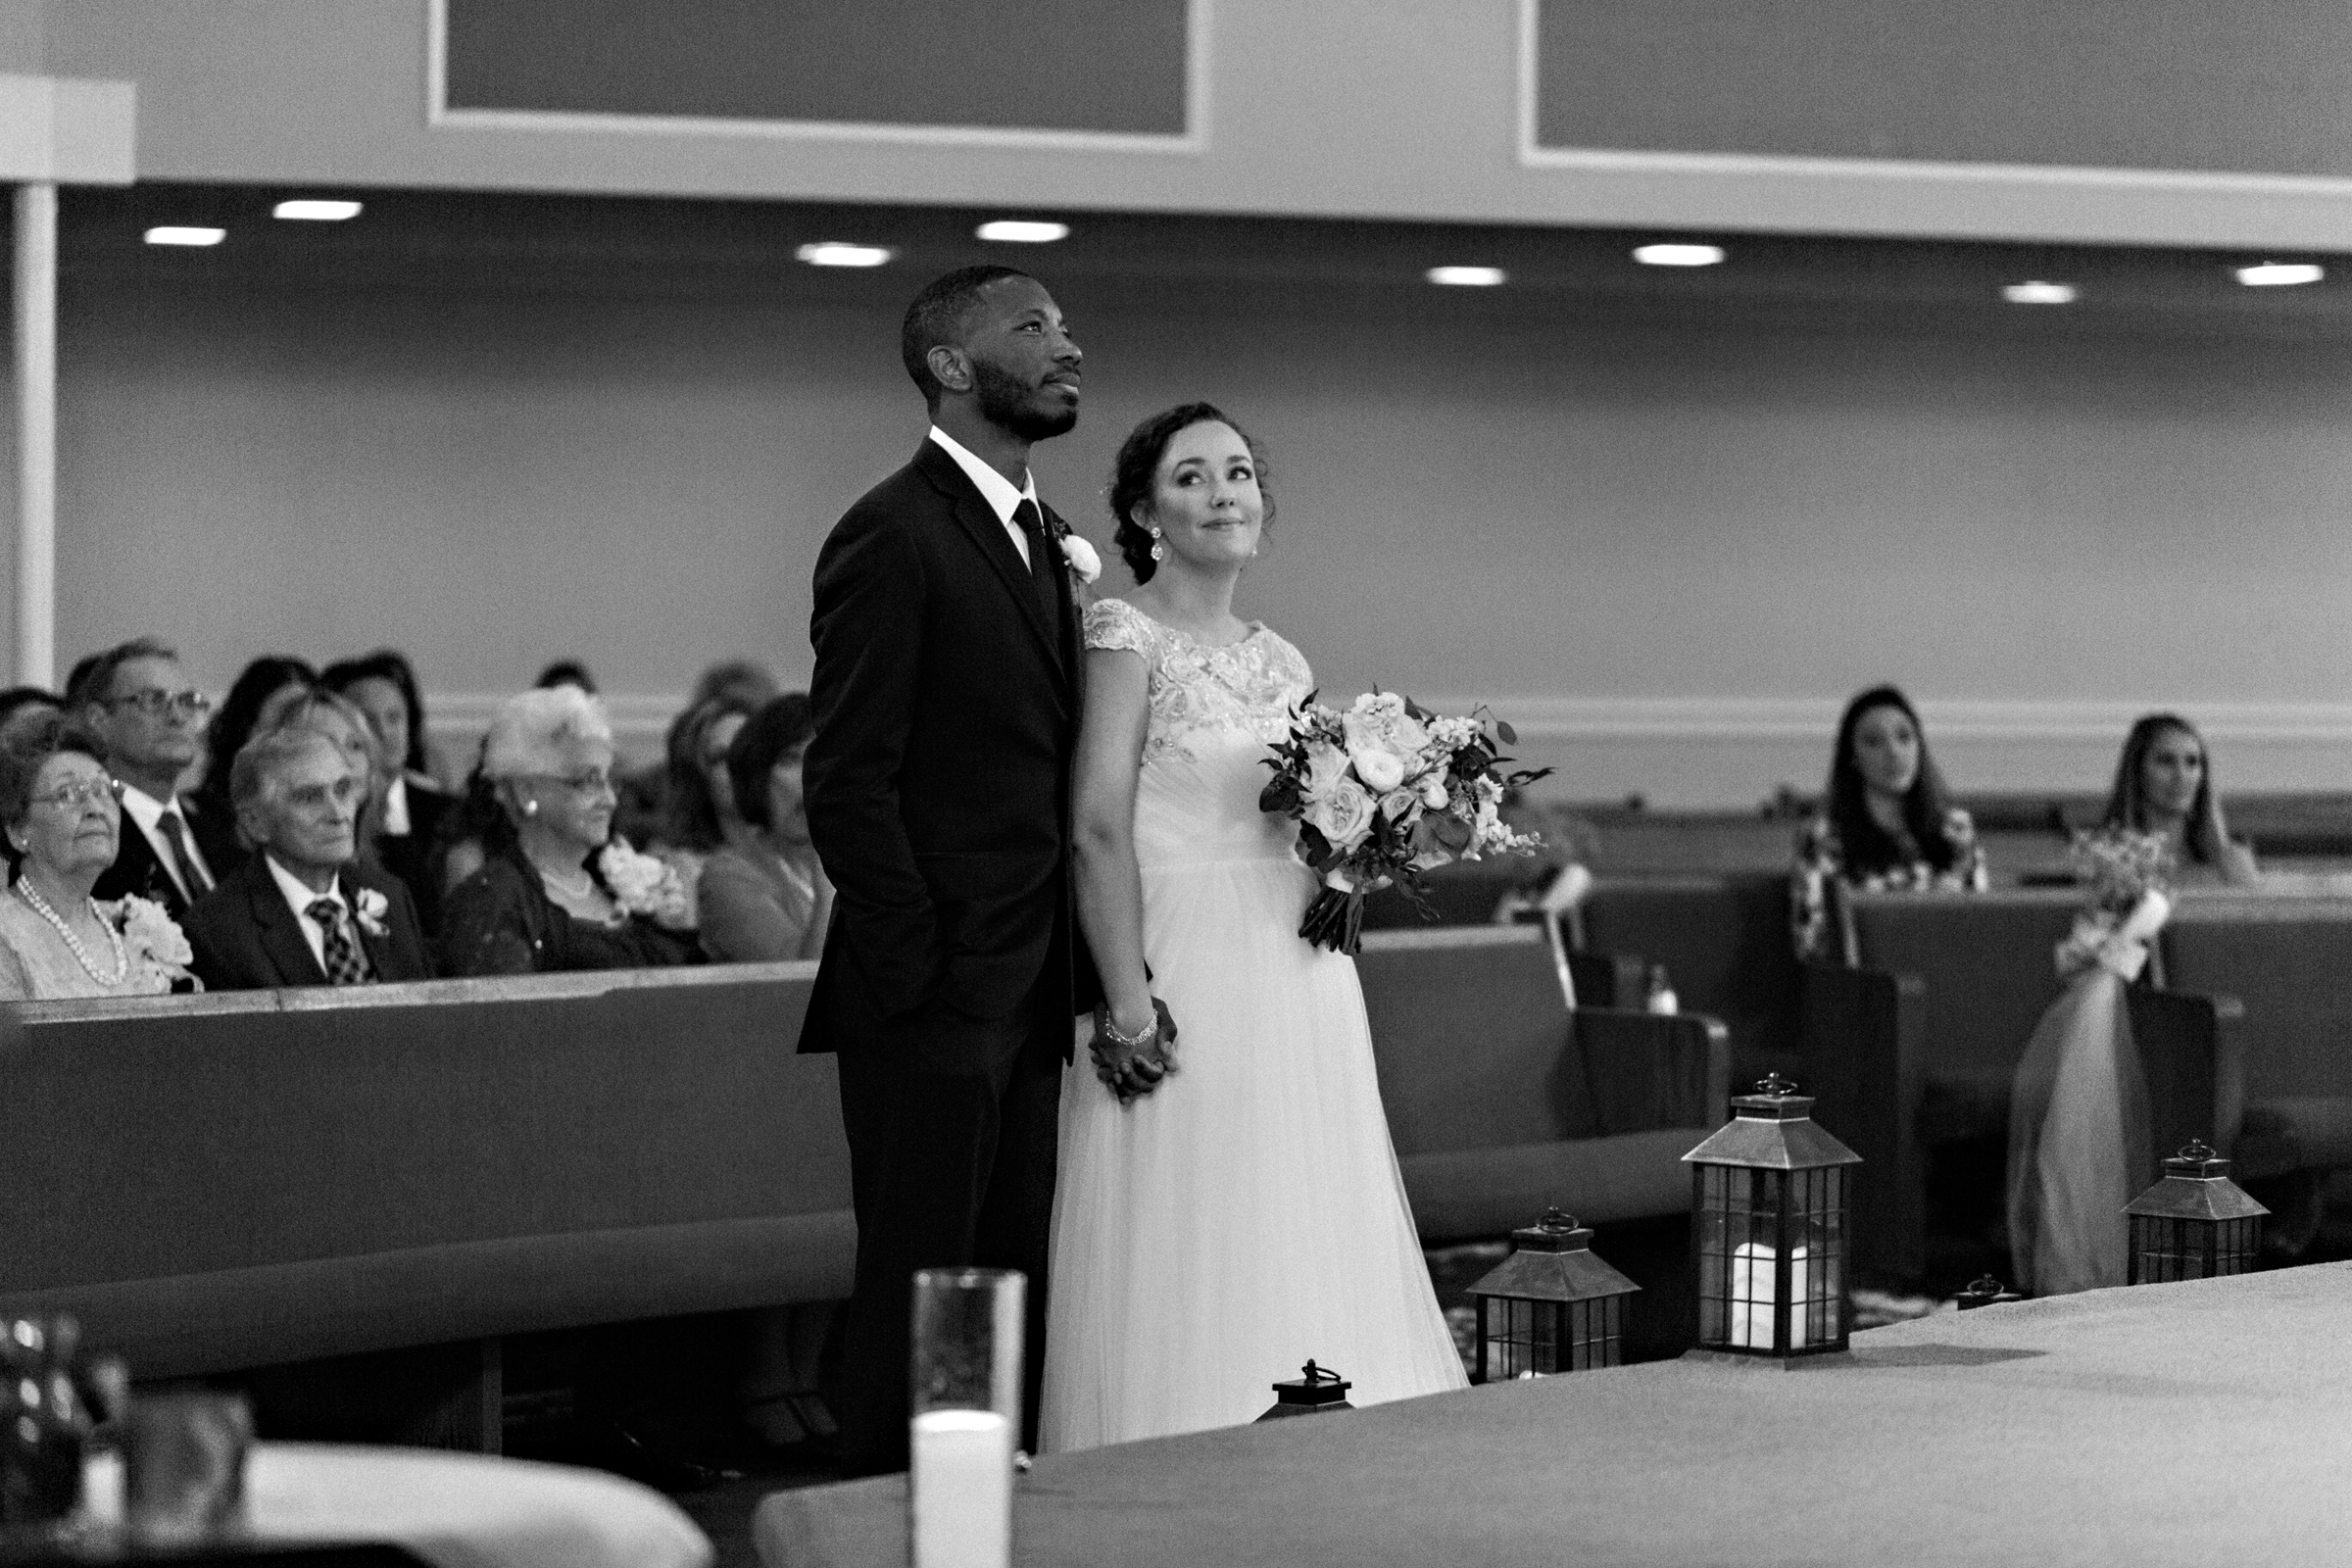 Alabama-Wedding-Photography-Nick-Drollette-Cory-Laura-145.jpg